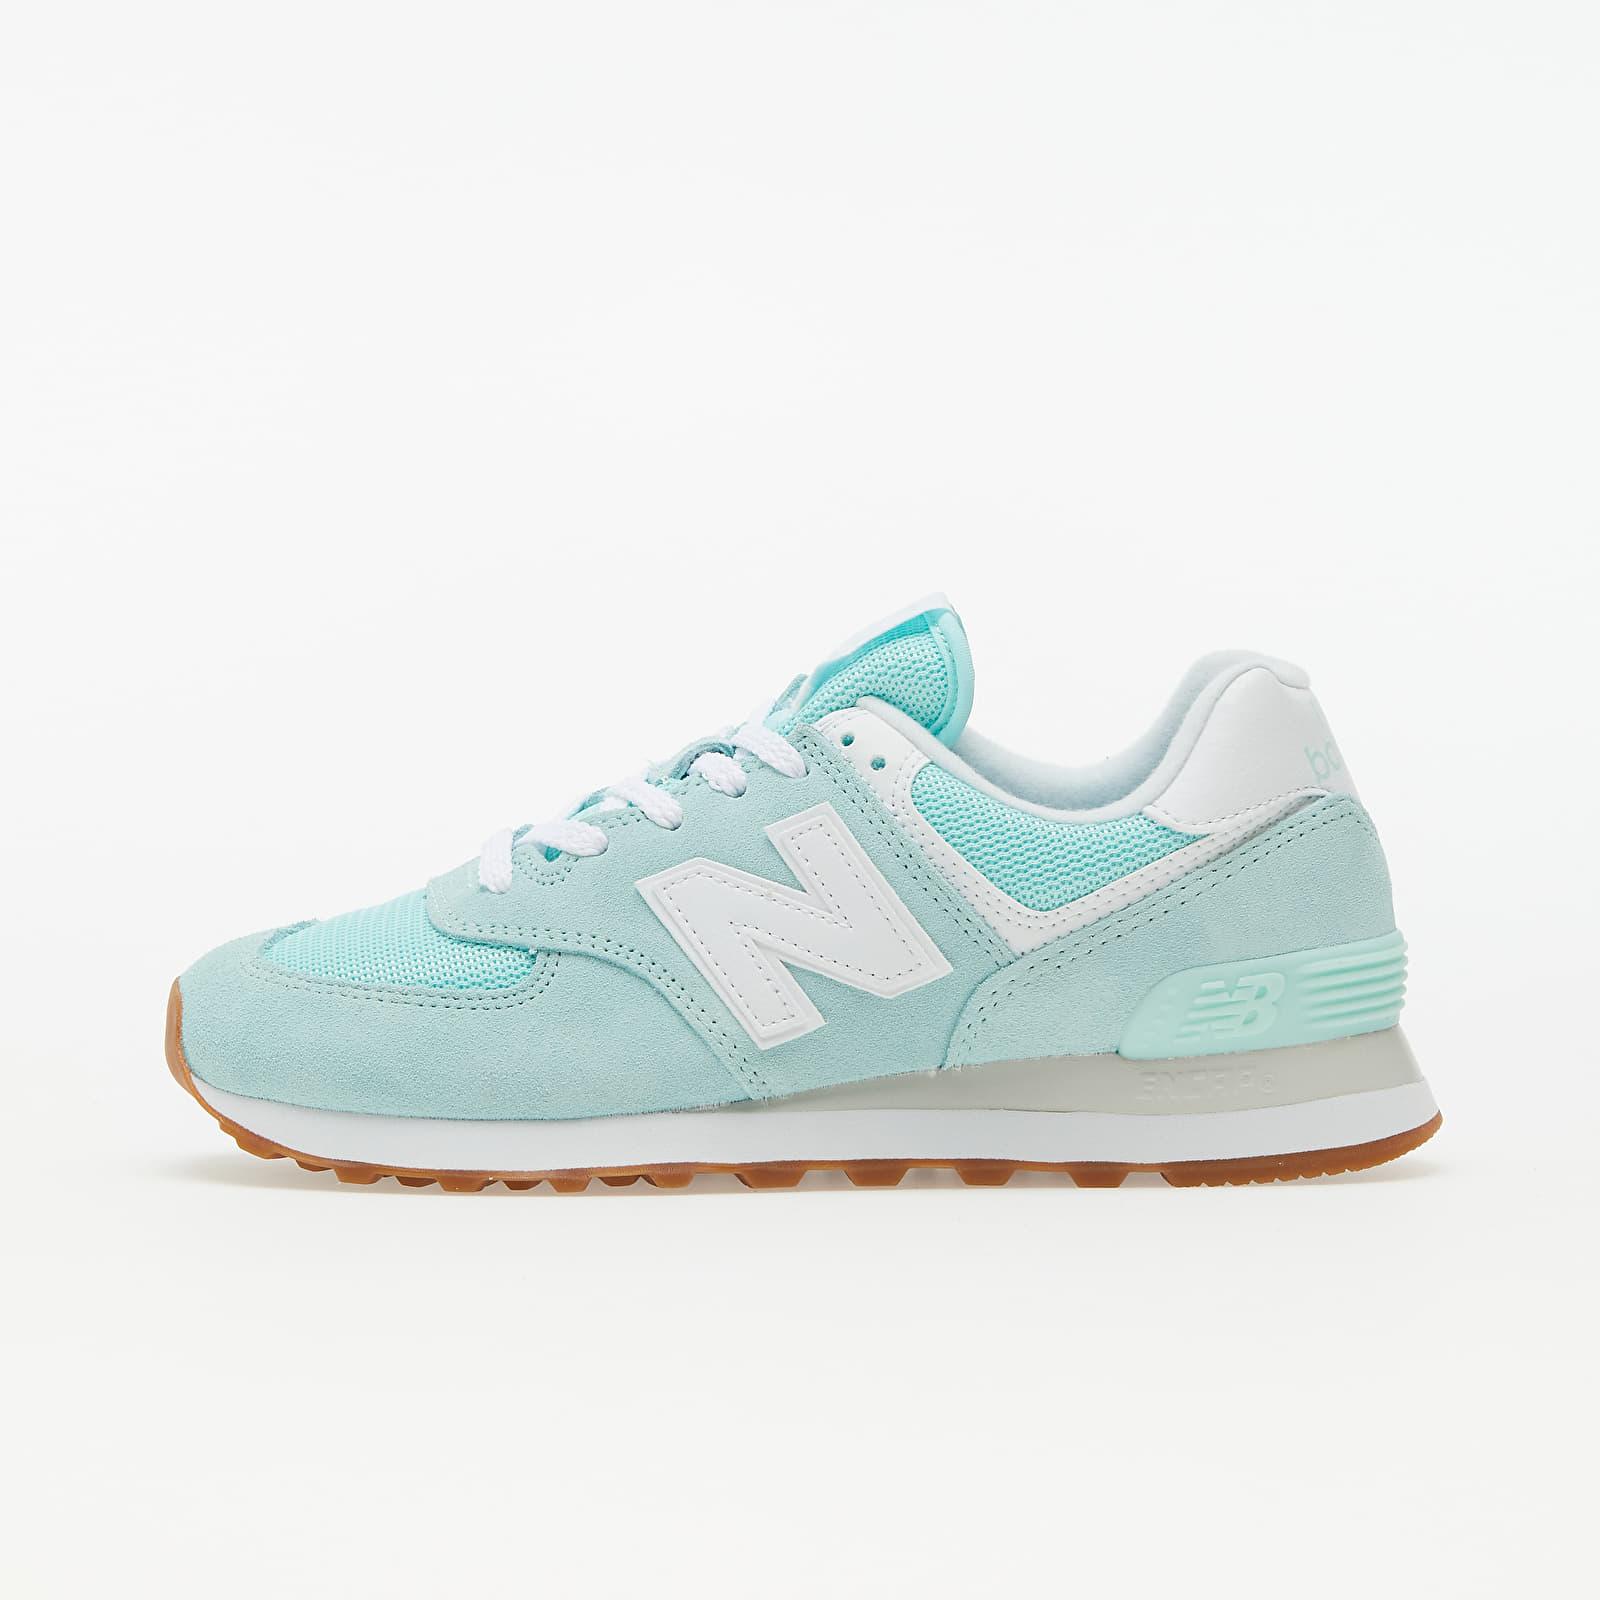 New Balance 574 Turquoise EUR 37